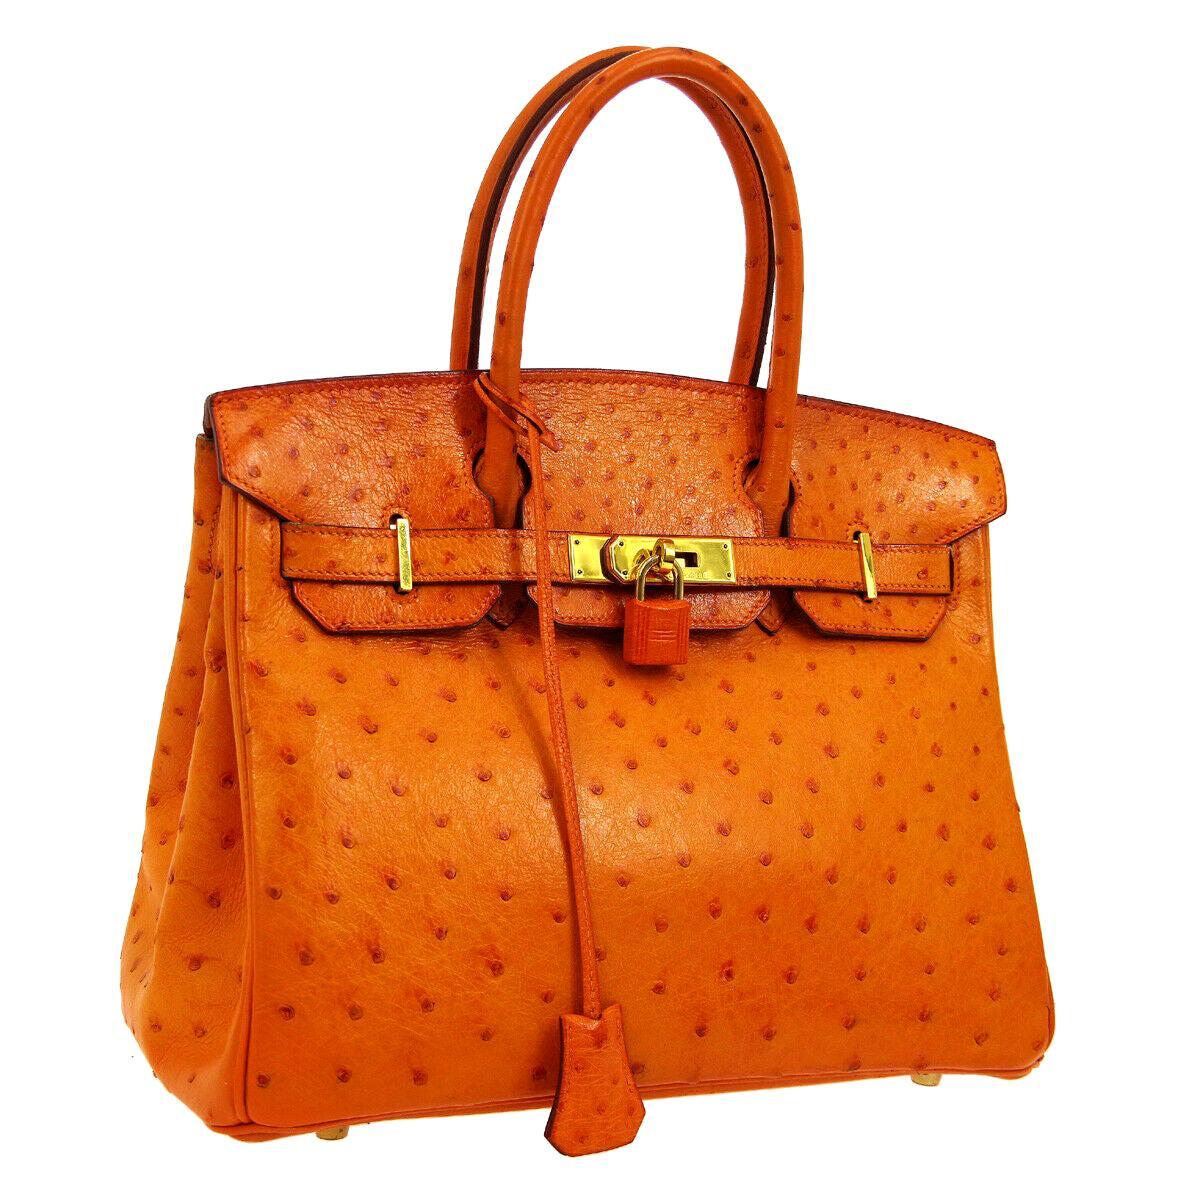 449771ac2 NEWFOUND LUXURY Top Handle Bags - 1stdibs